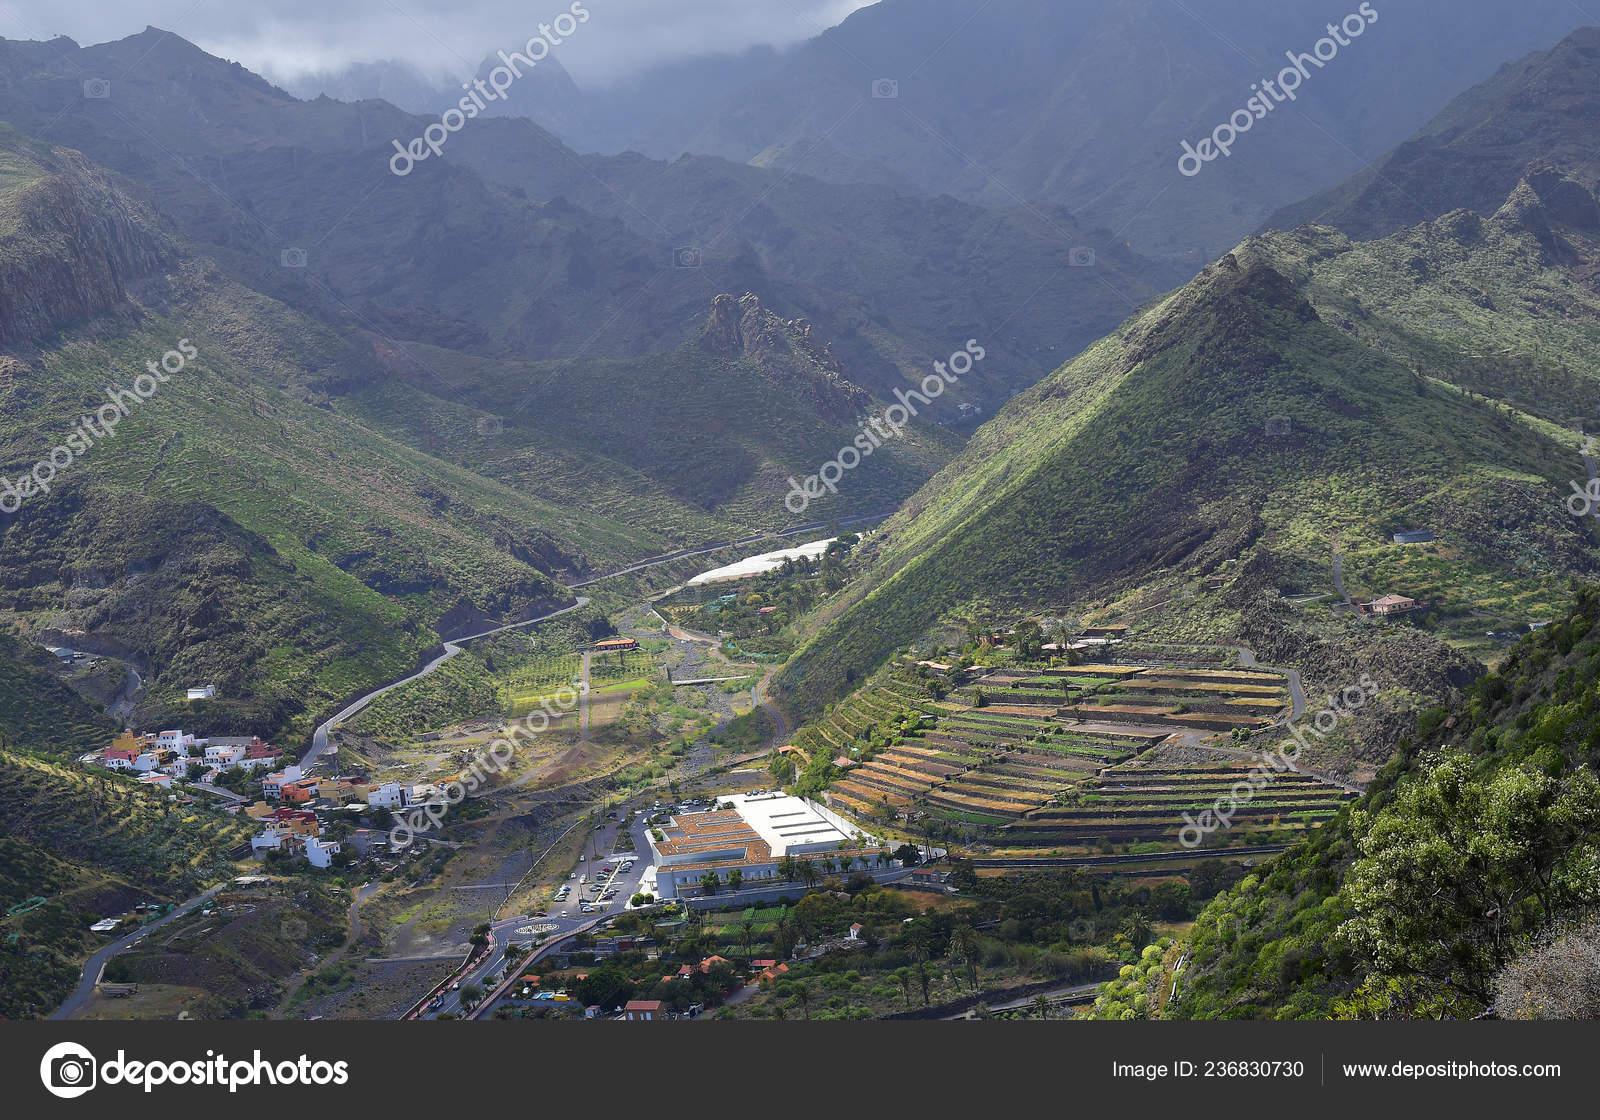 España Islas Canarias Gomera Paisaje Con Montañas Terrazas